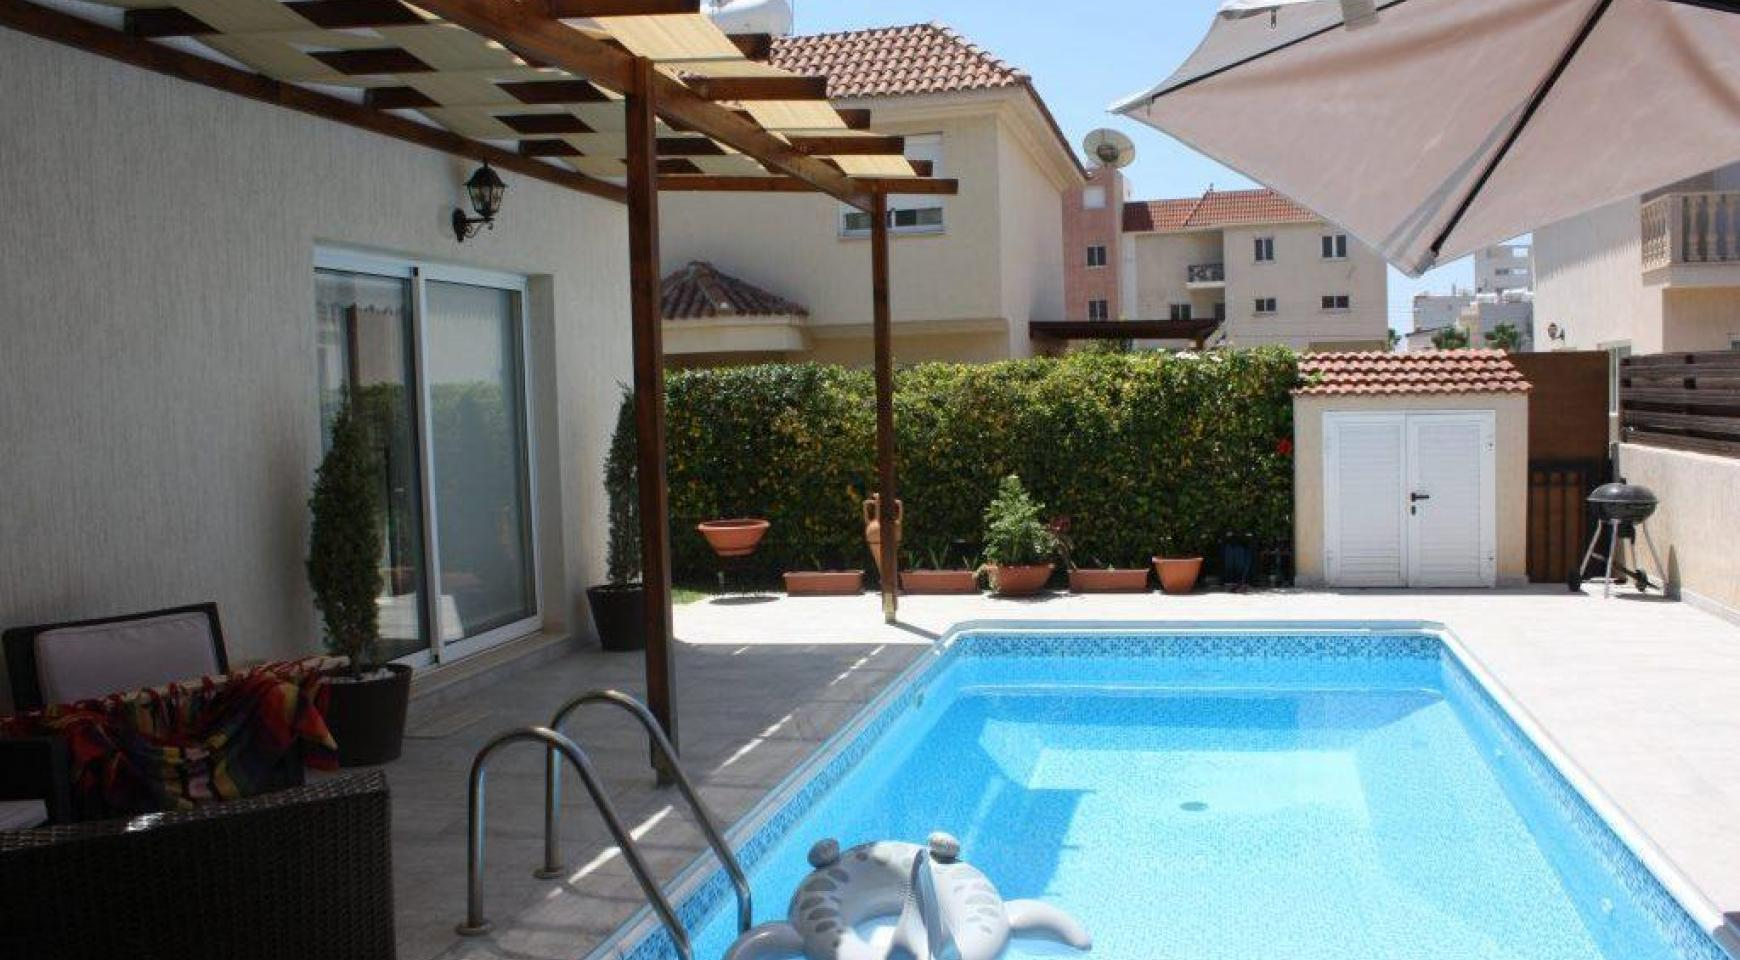 3 Bedroom House in Potamos Germasogeia Area - 1